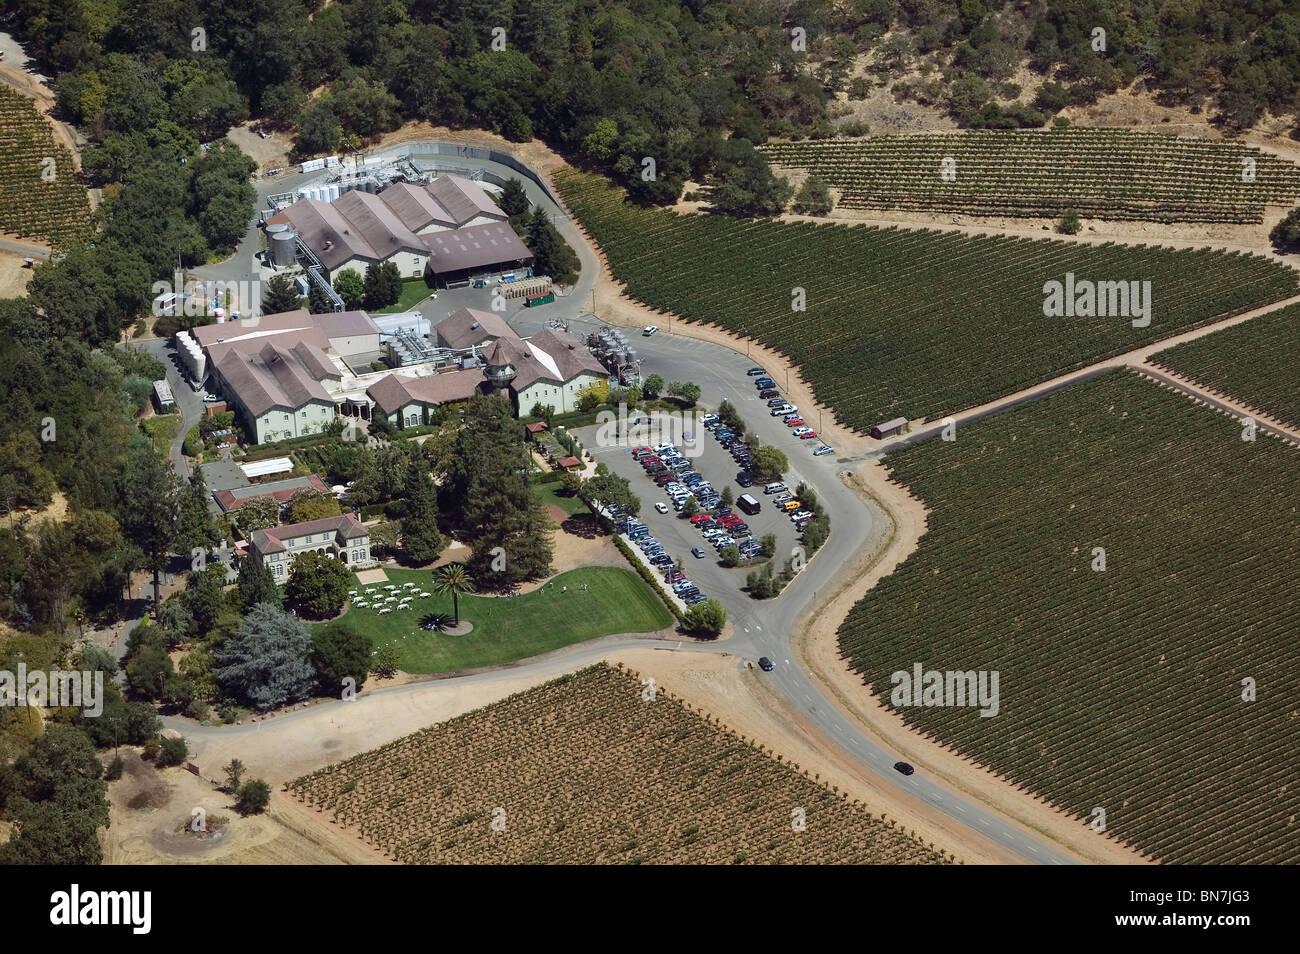 aerial view above vineyard tasting room Sonoma Valley California USA - Stock Image